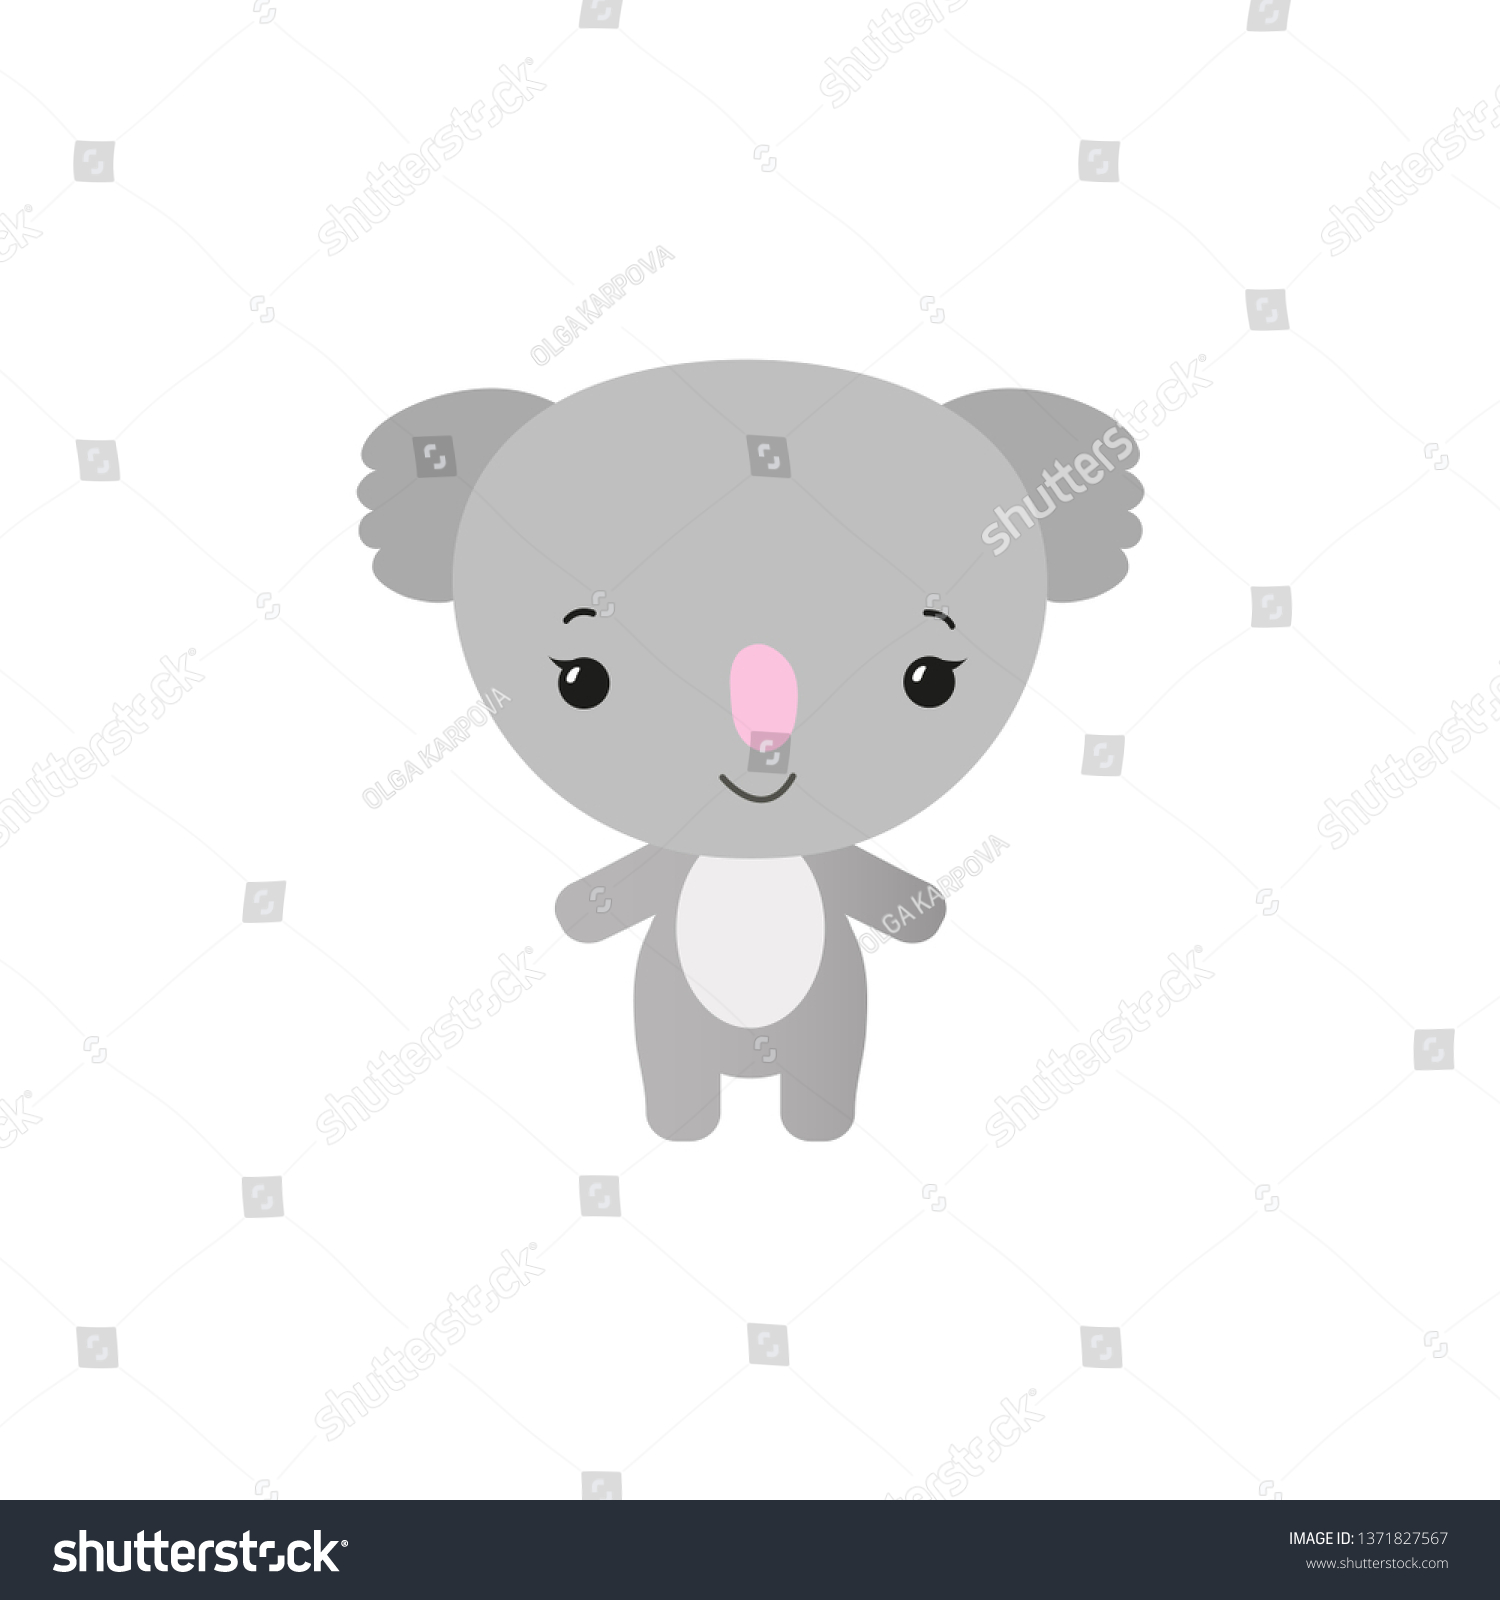 Cute Koala Animal Kawaii Style Funny Stock Vector Royalty Free